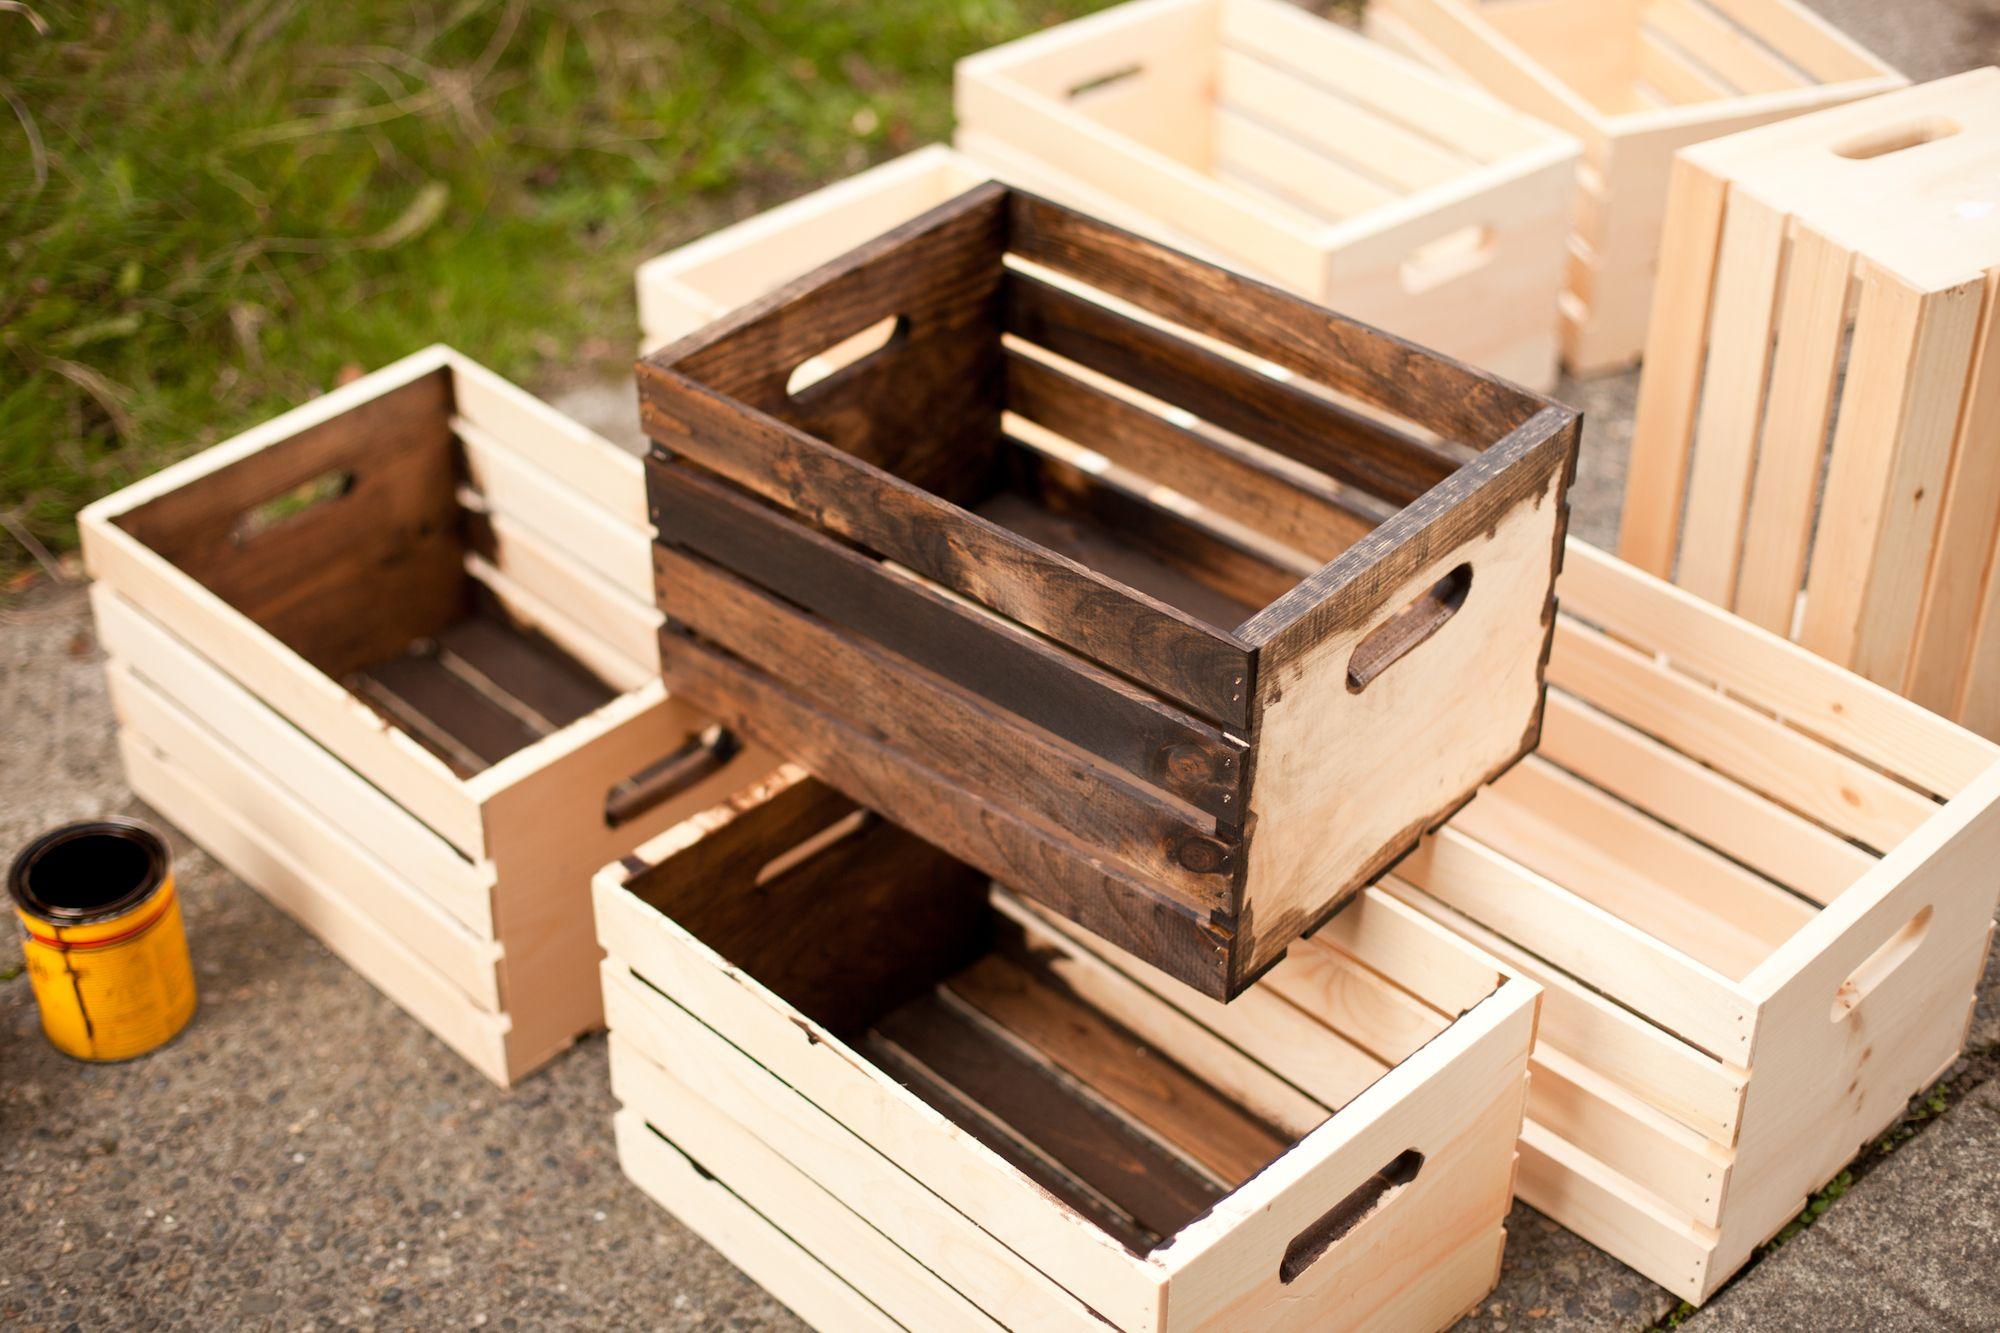 Apple Crates Crates Apple Crates Diy Home Security